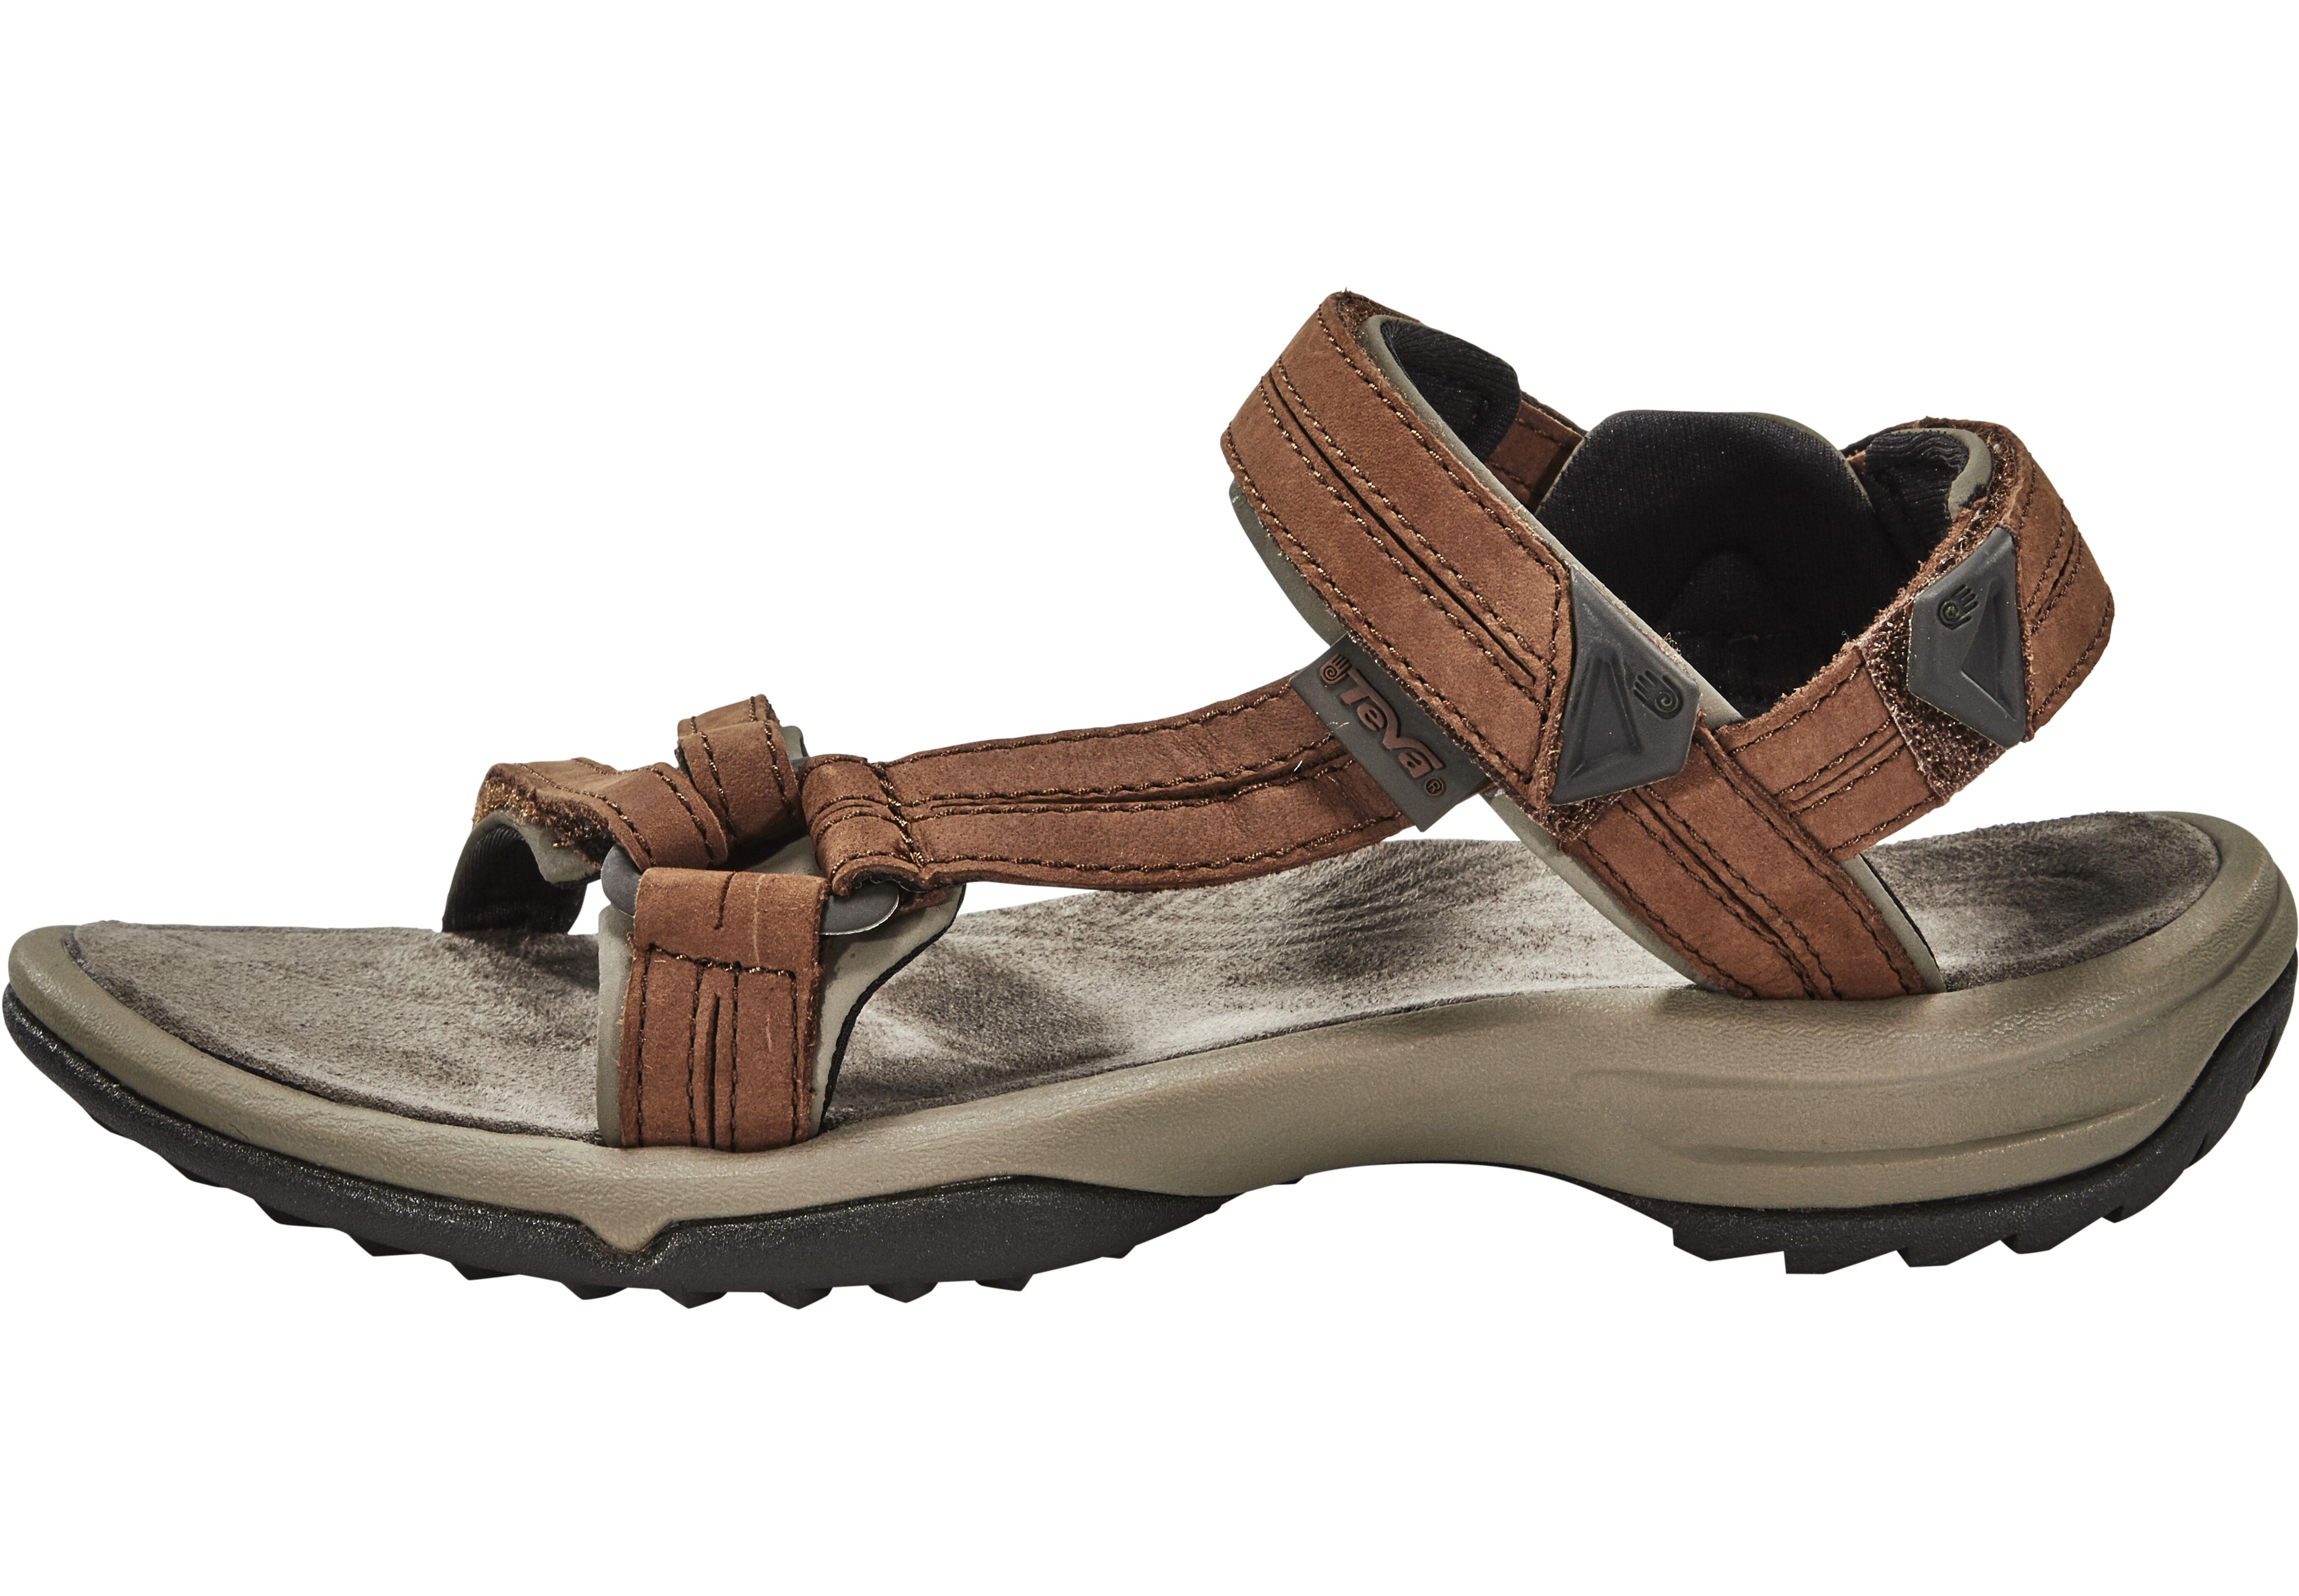 5c426c2e0 Teva Terra Fi Lite Leather Sandals Women brown at Addnature.co.uk